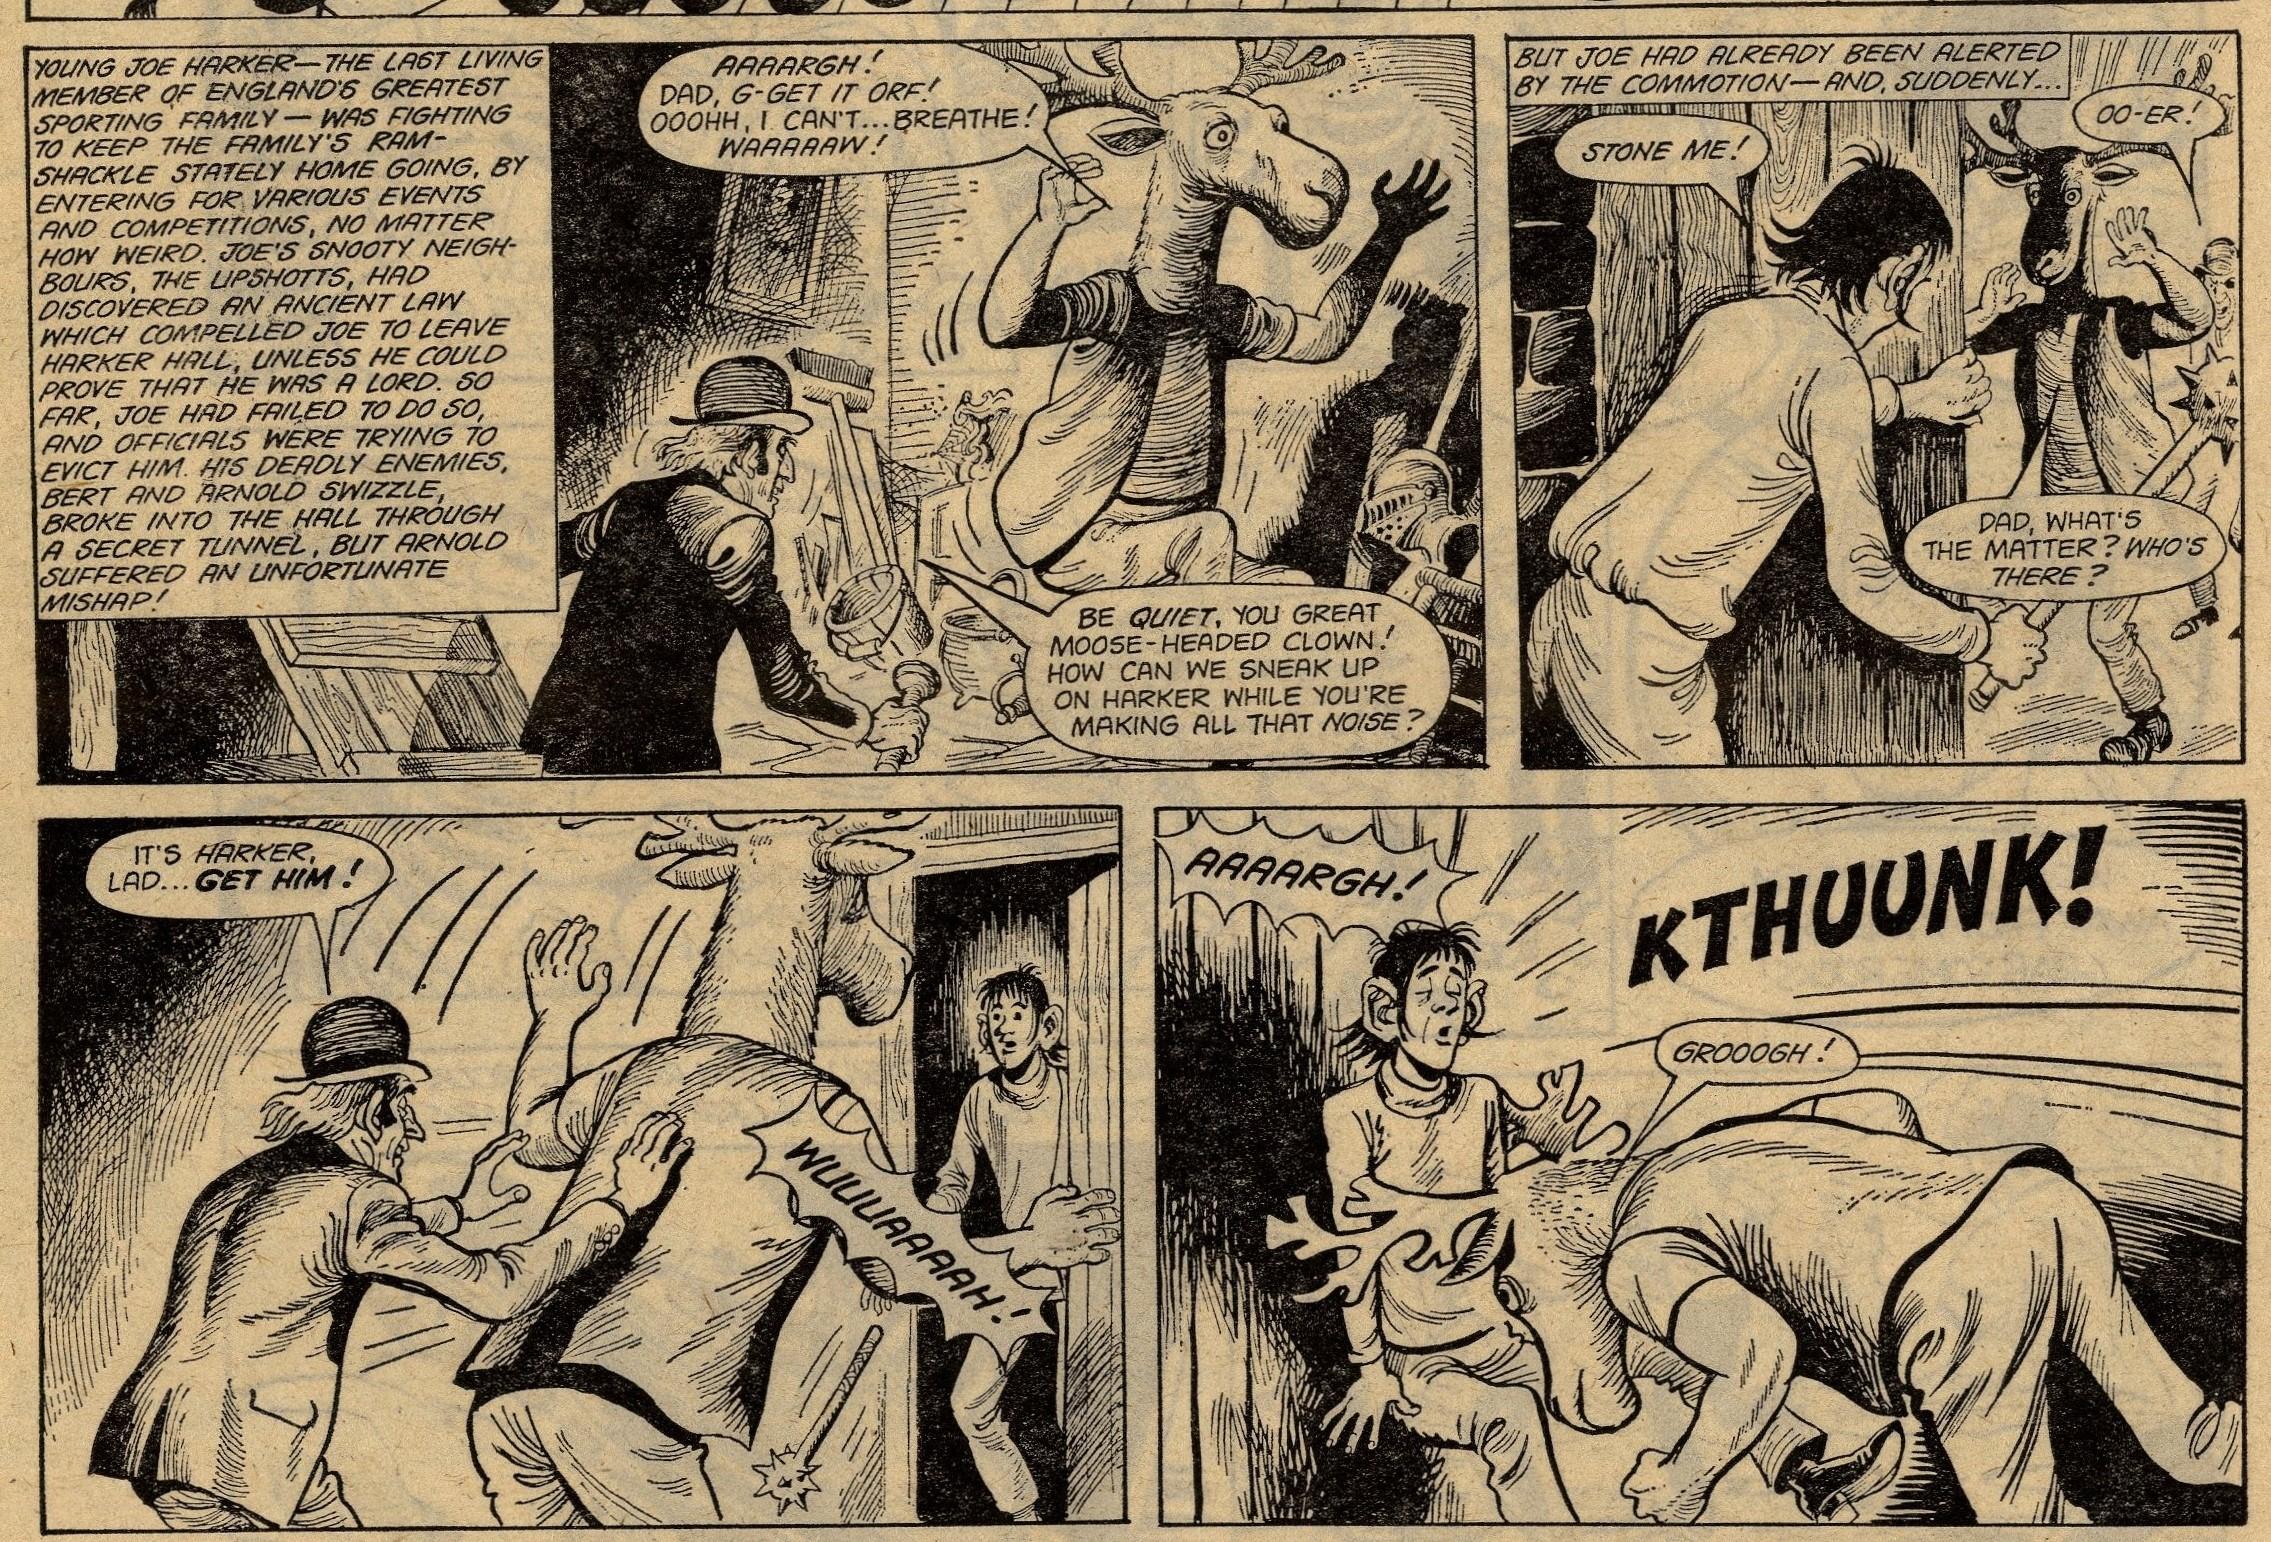 The Last of the Harkers:   Tom Tully? (writer), John Stokes? (artist)